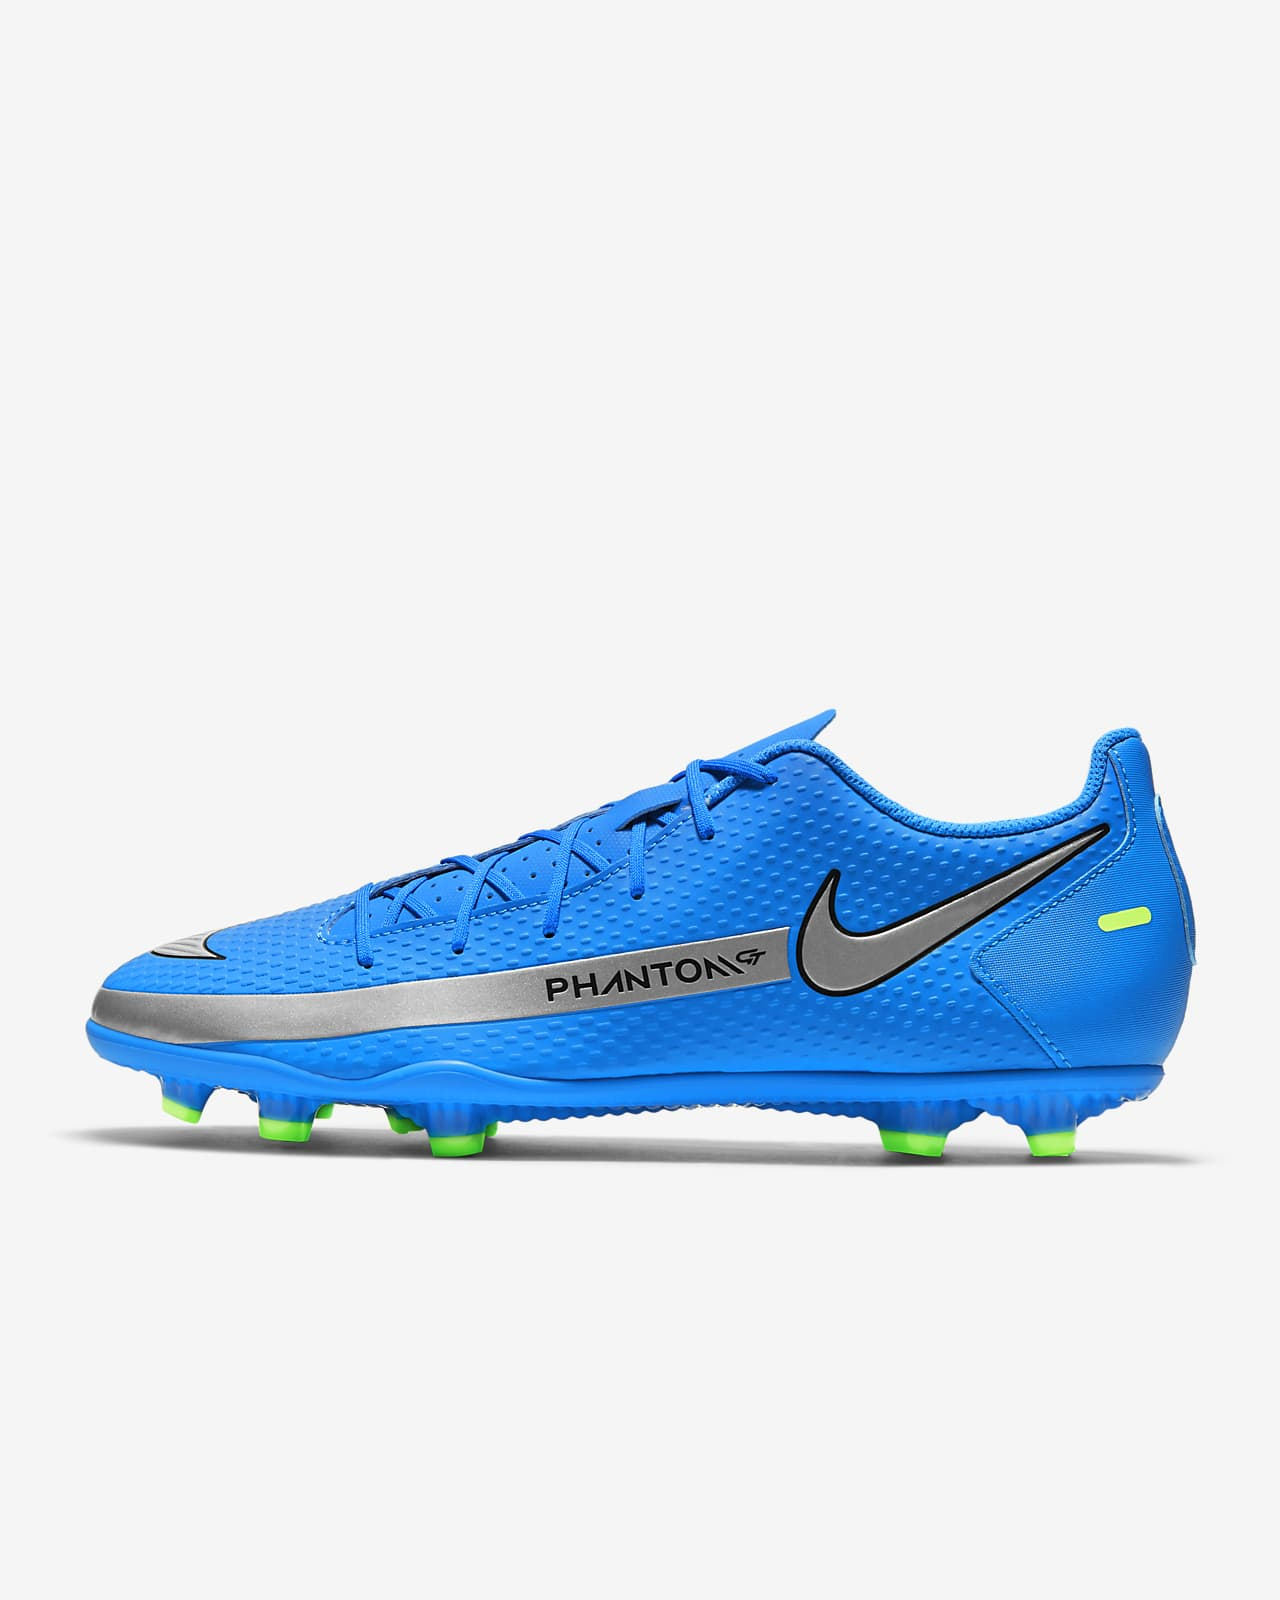 Nike Phantom GT Club MG Multi-Ground Football Boot